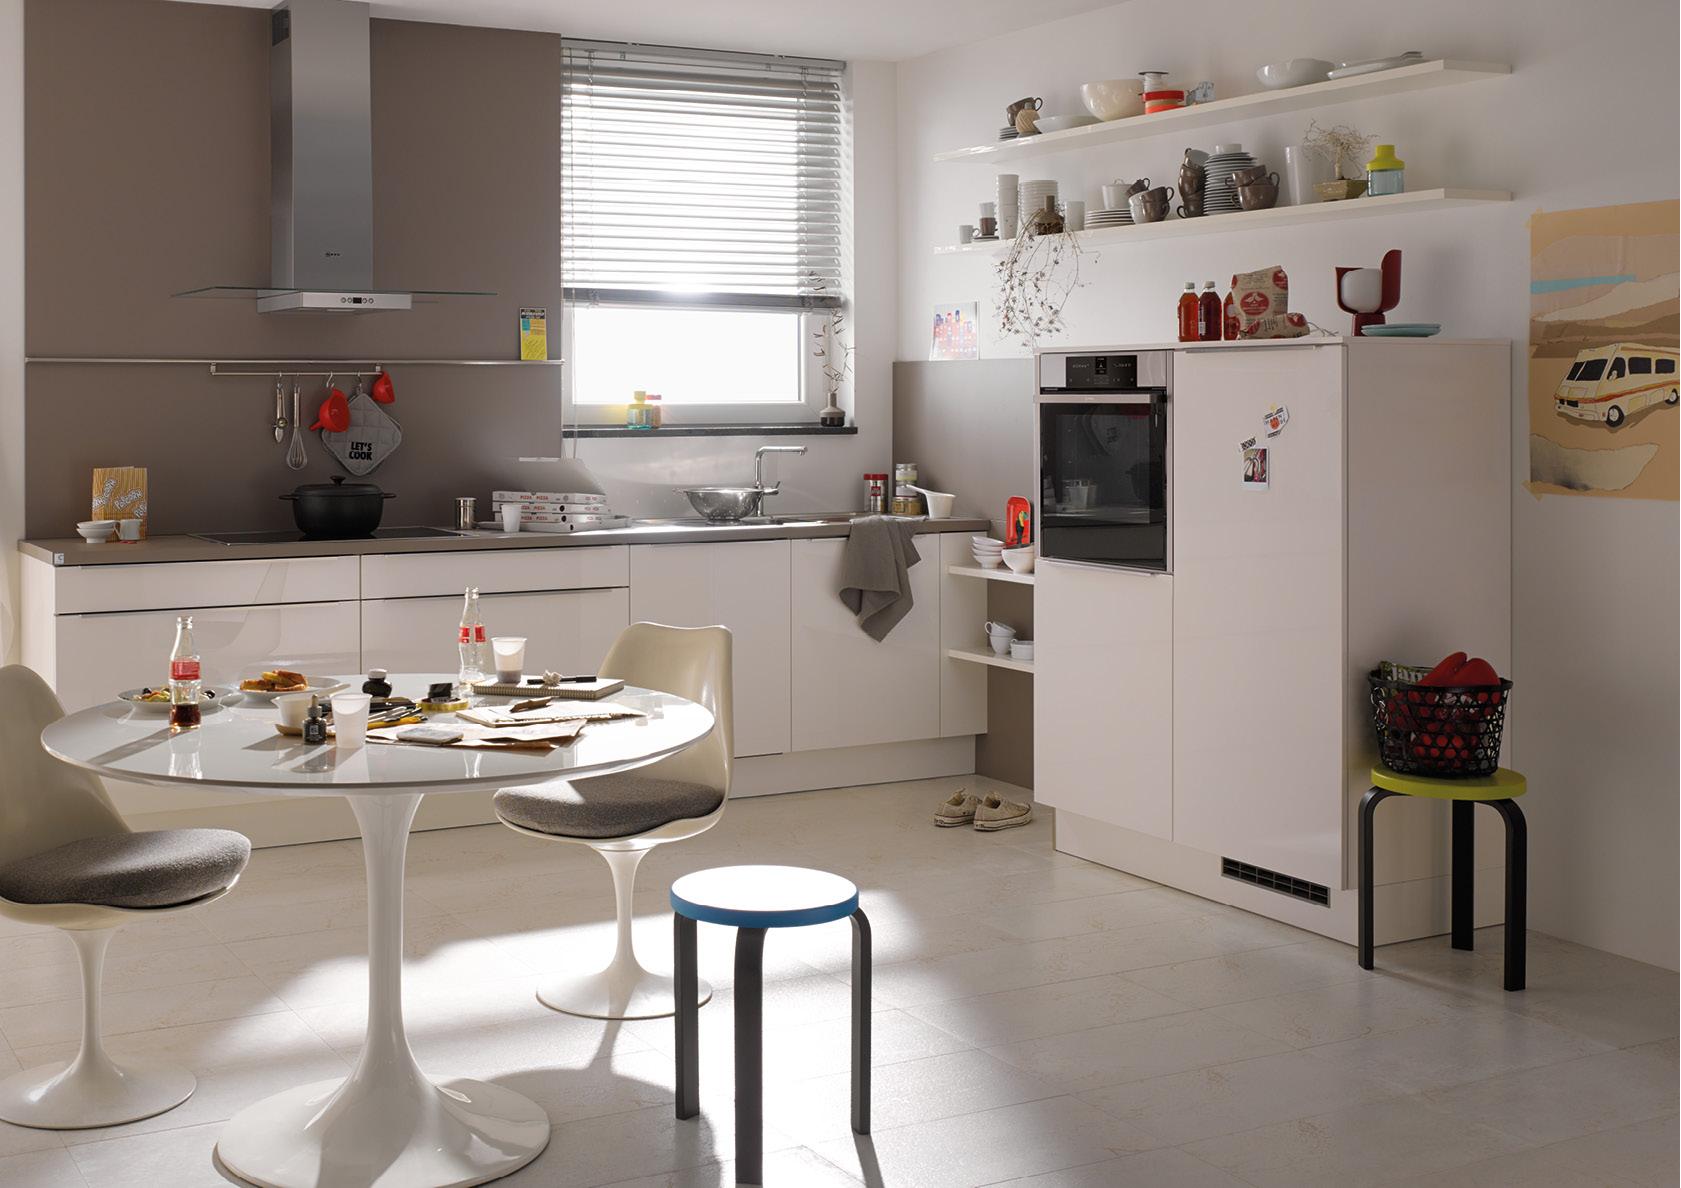 wei m bel bohn gmbh in hilchenbach m sen. Black Bedroom Furniture Sets. Home Design Ideas